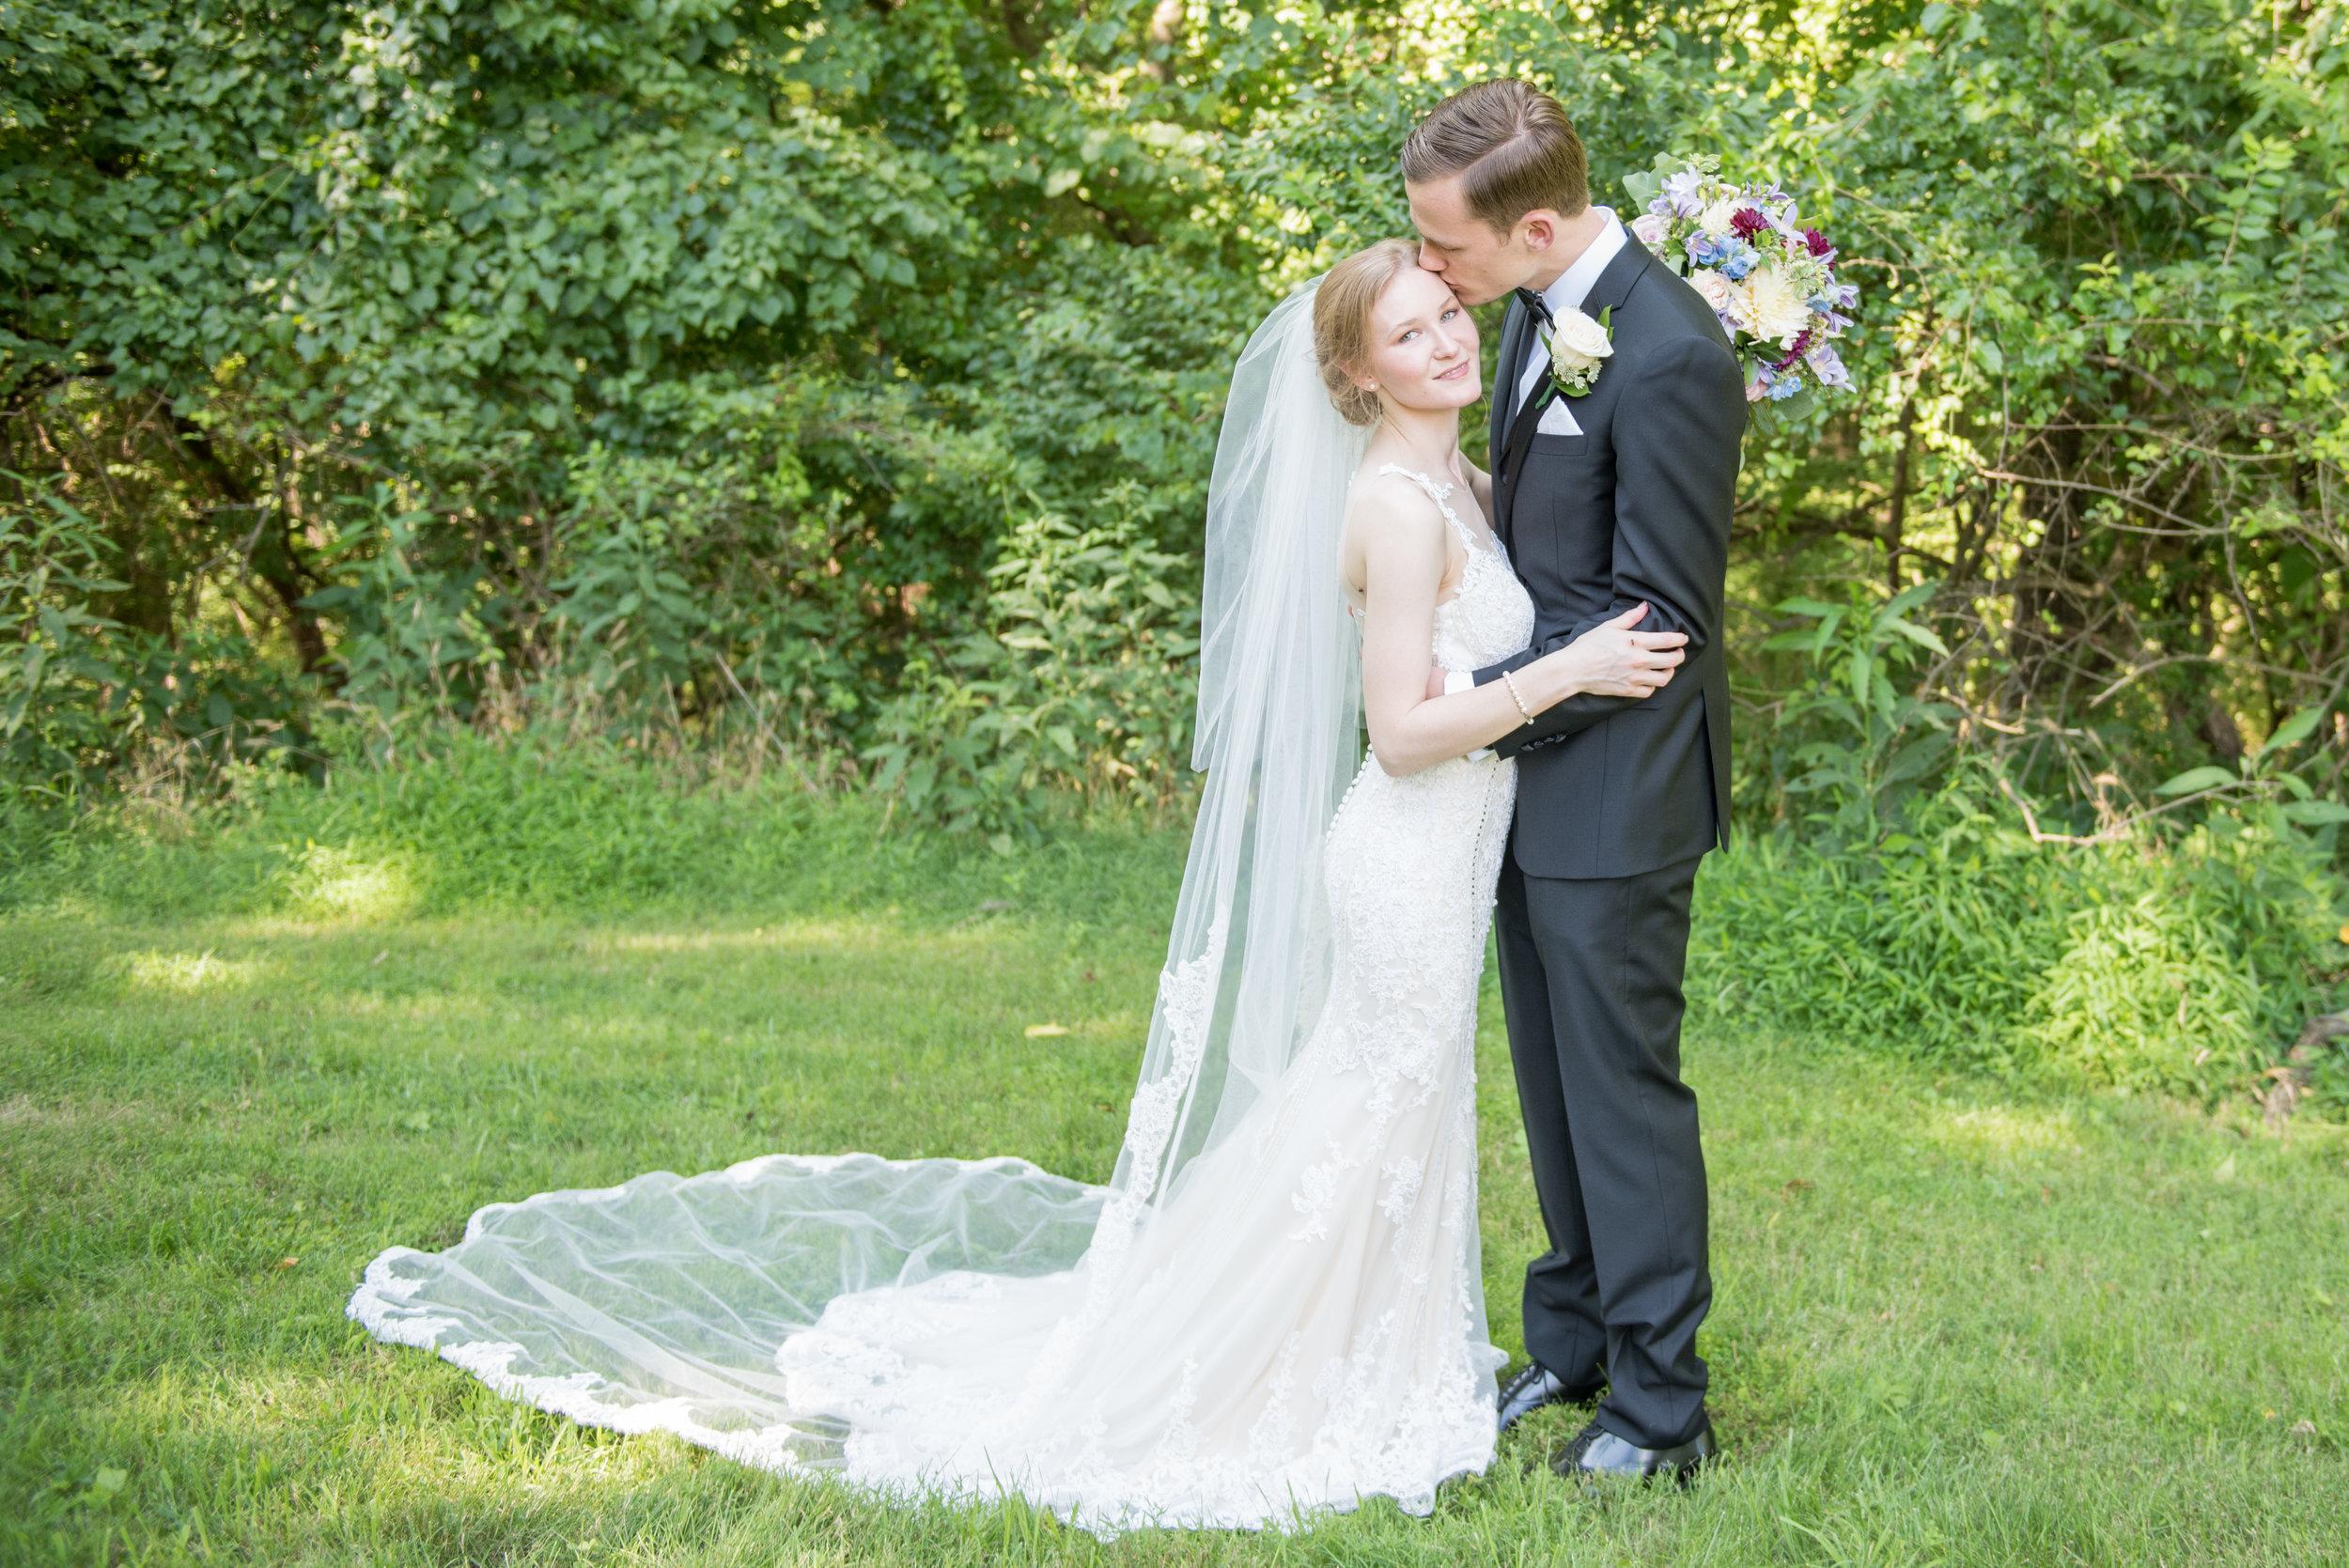 john & ericca wedding- bride and groom (2).jpg